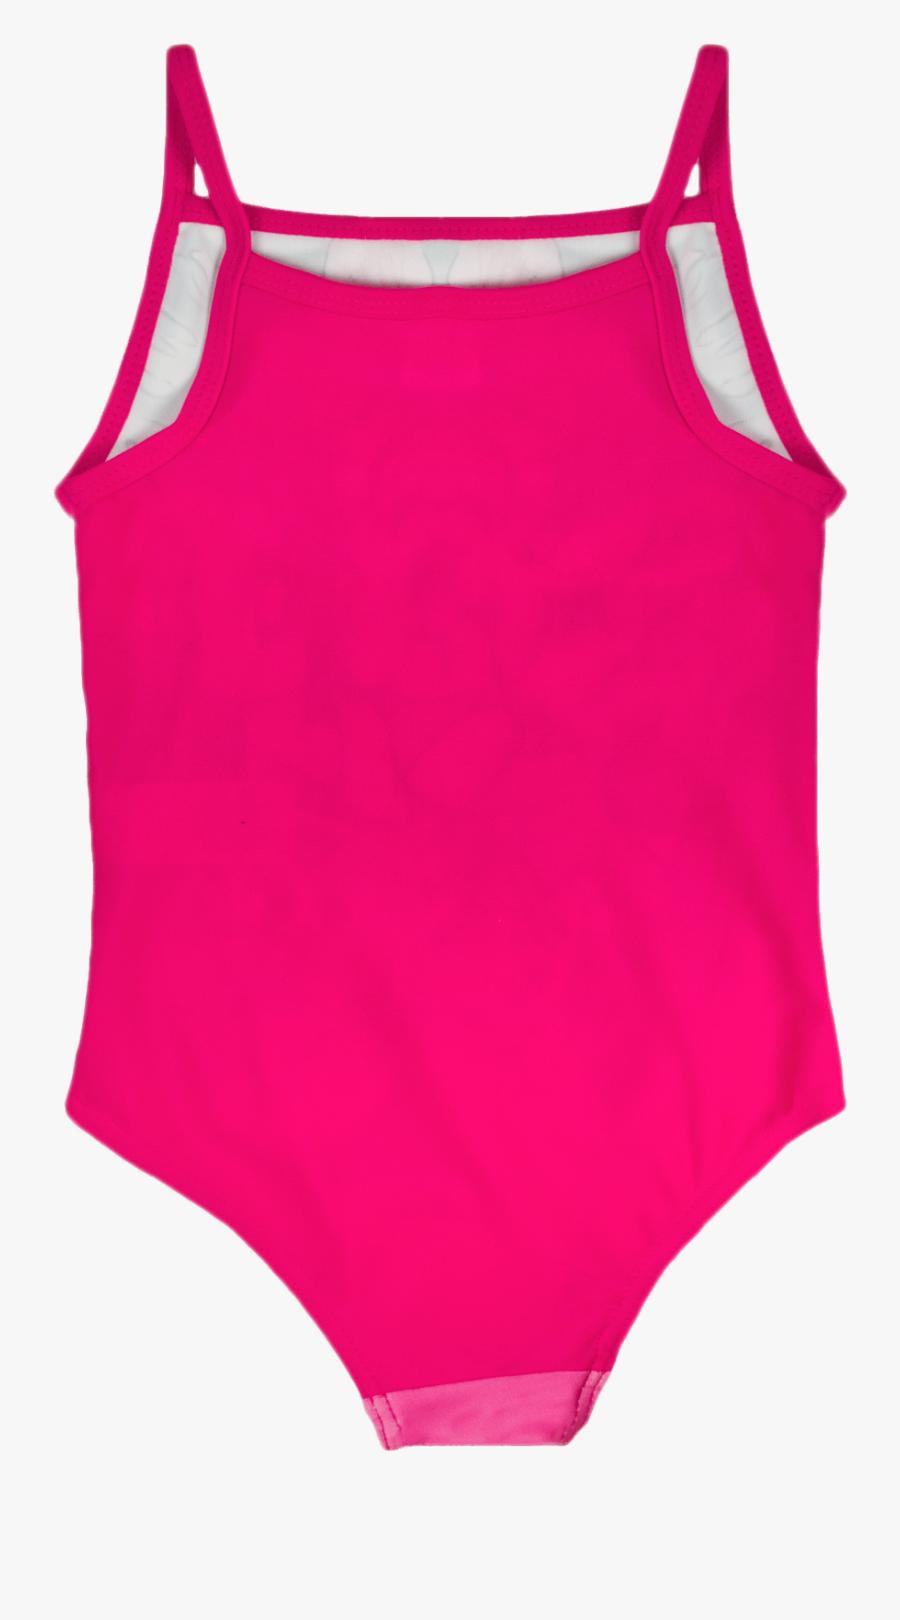 Pink Swimming Suit - Swimsuit, Transparent Clipart